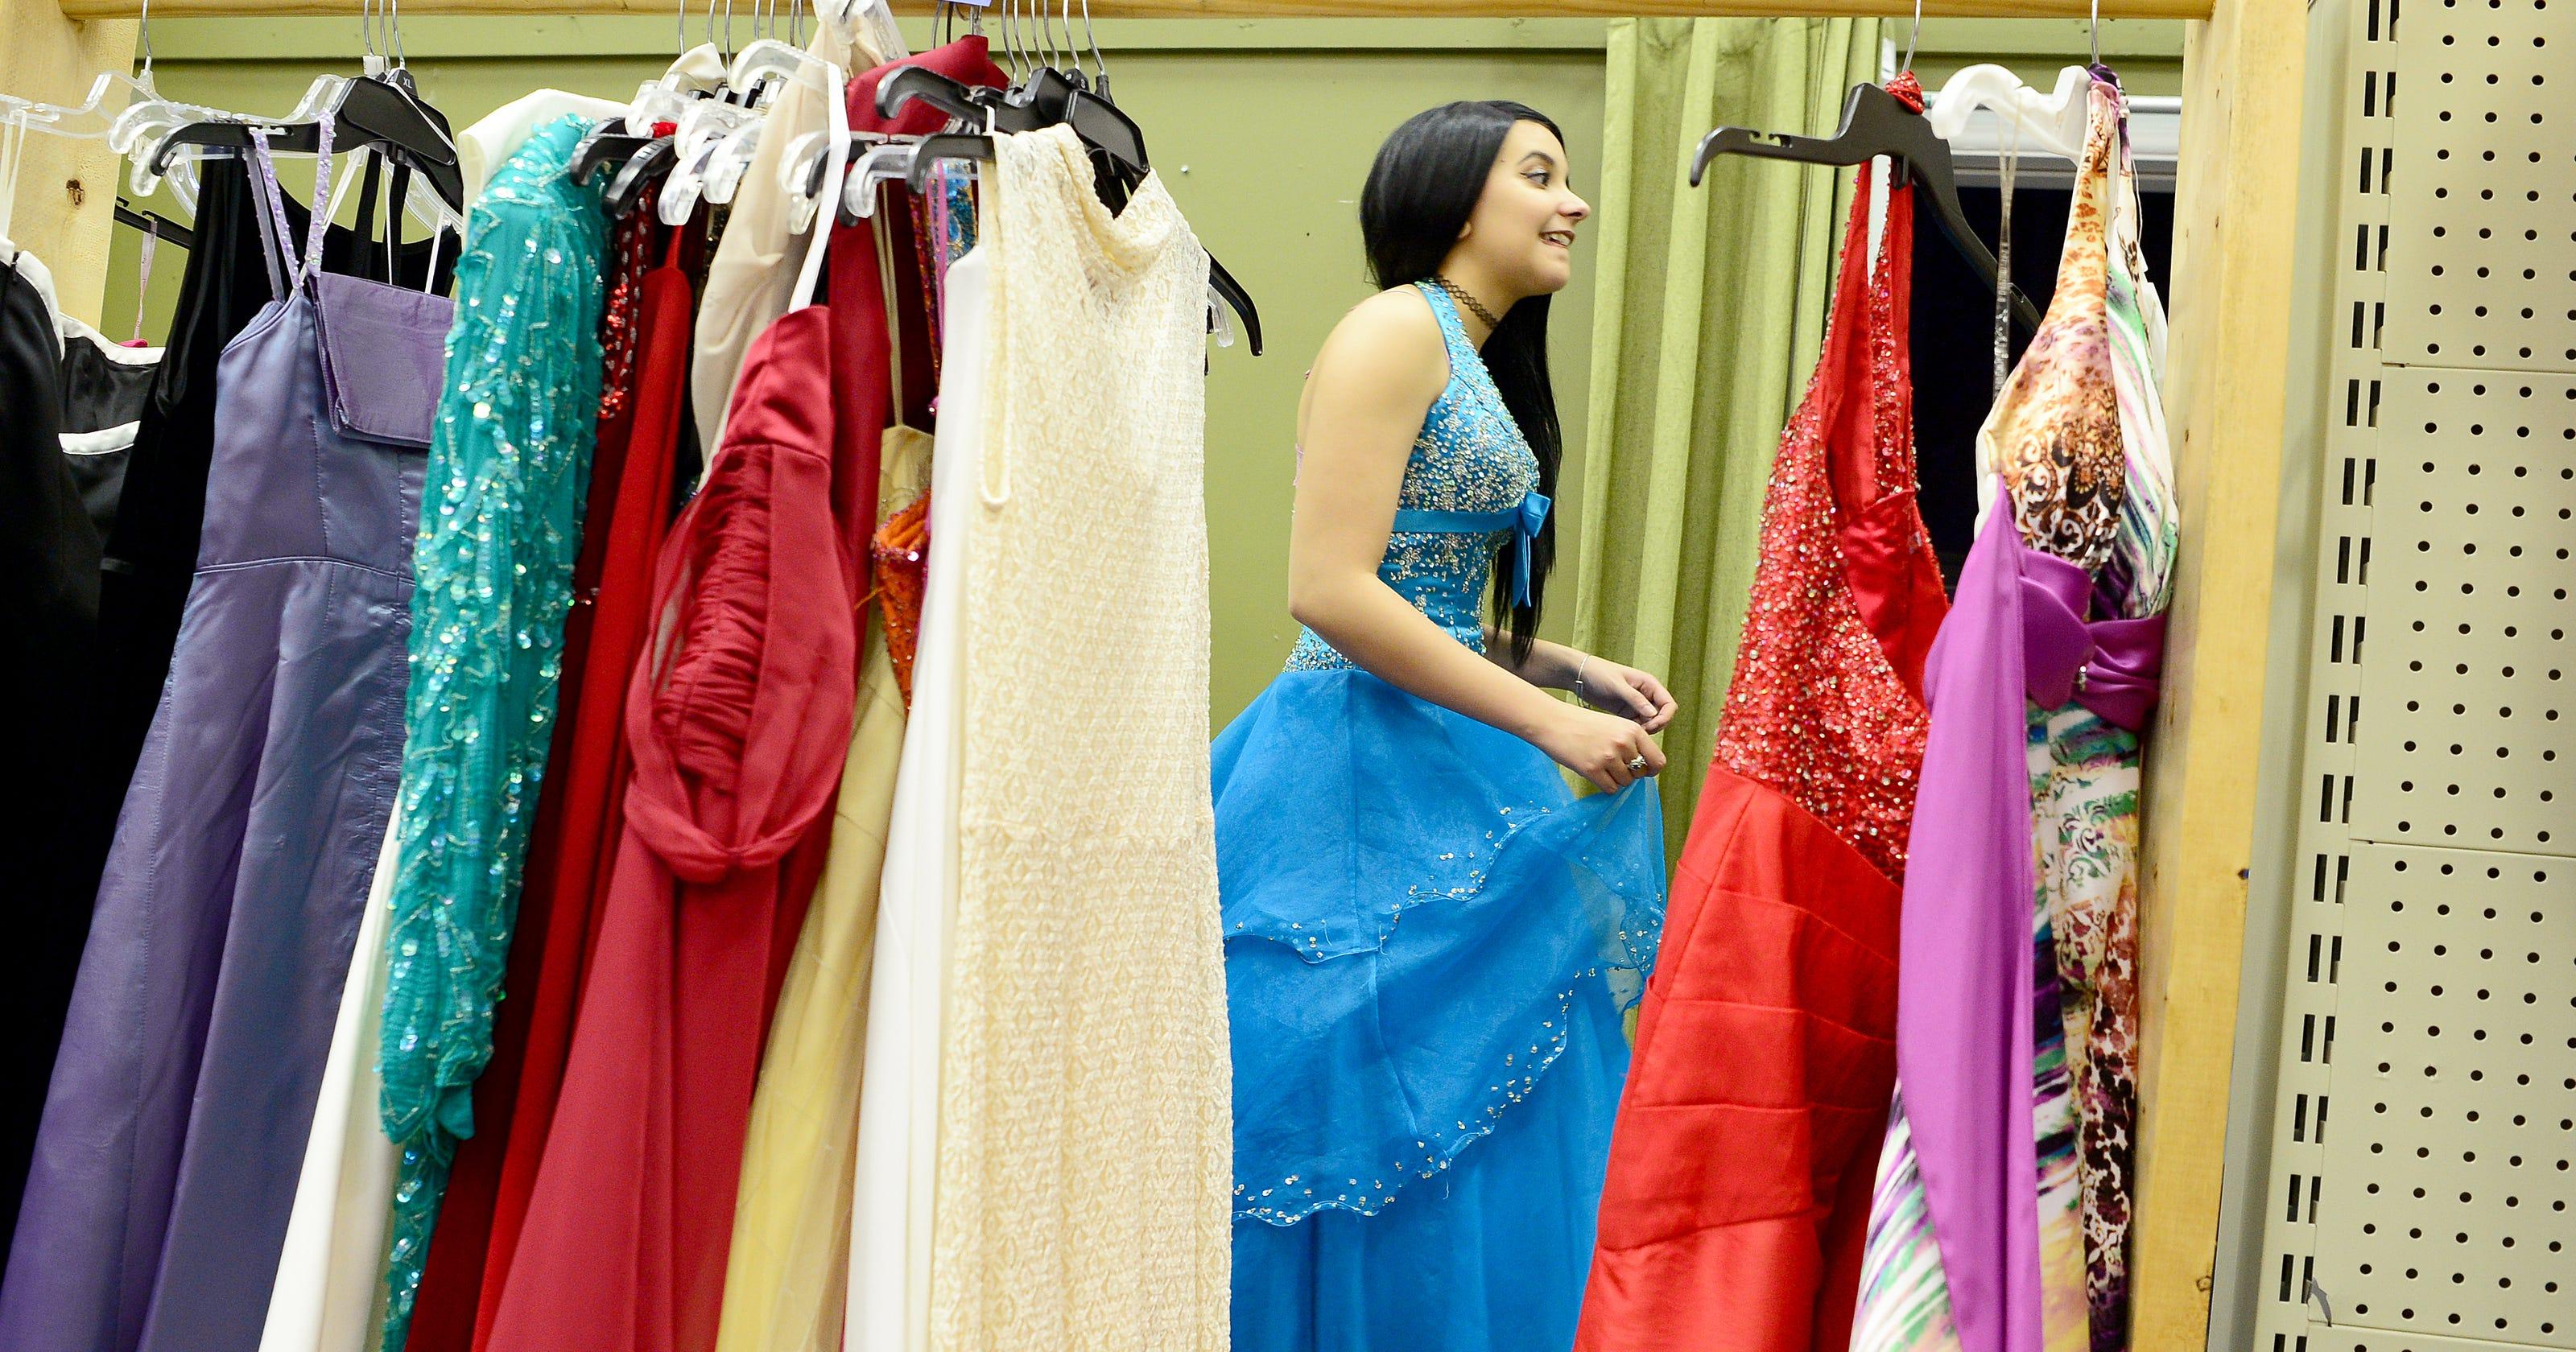 d12075e0e5d Local Prom Dress Stores Near Me